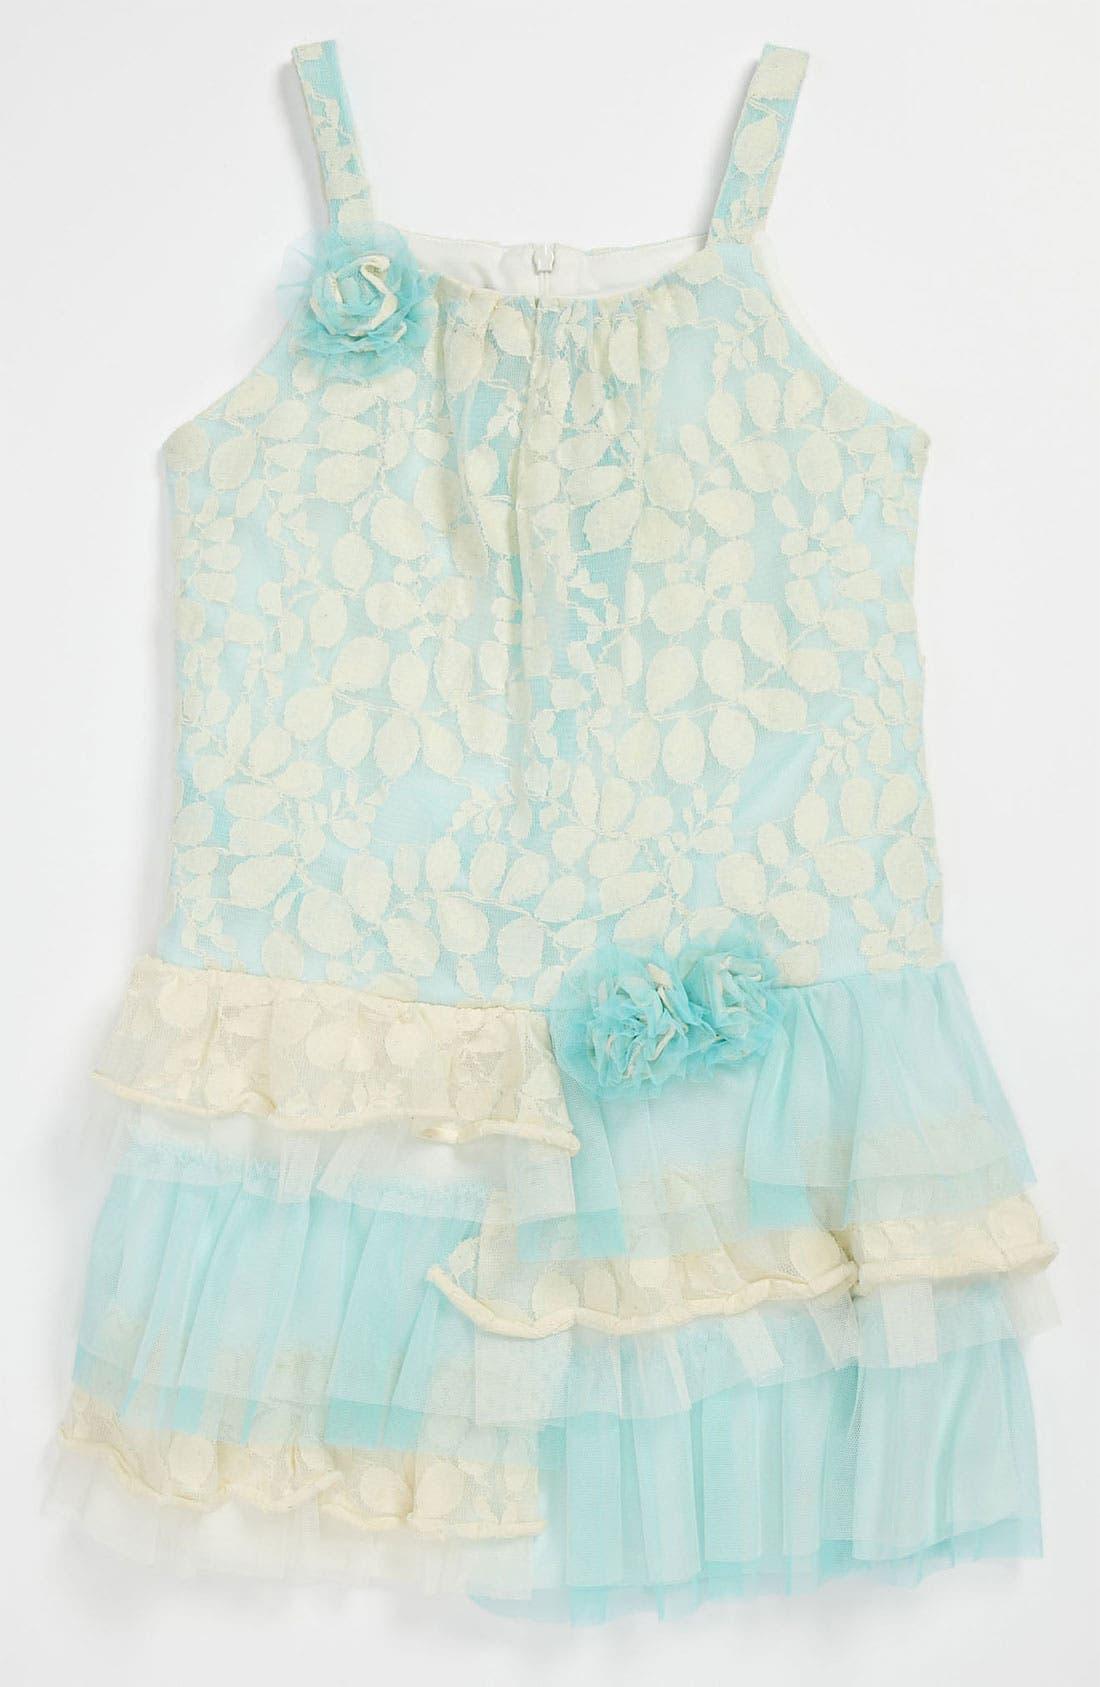 Main Image - Isobella & Chloe Lace Dress (Little Girls & Big Girls)